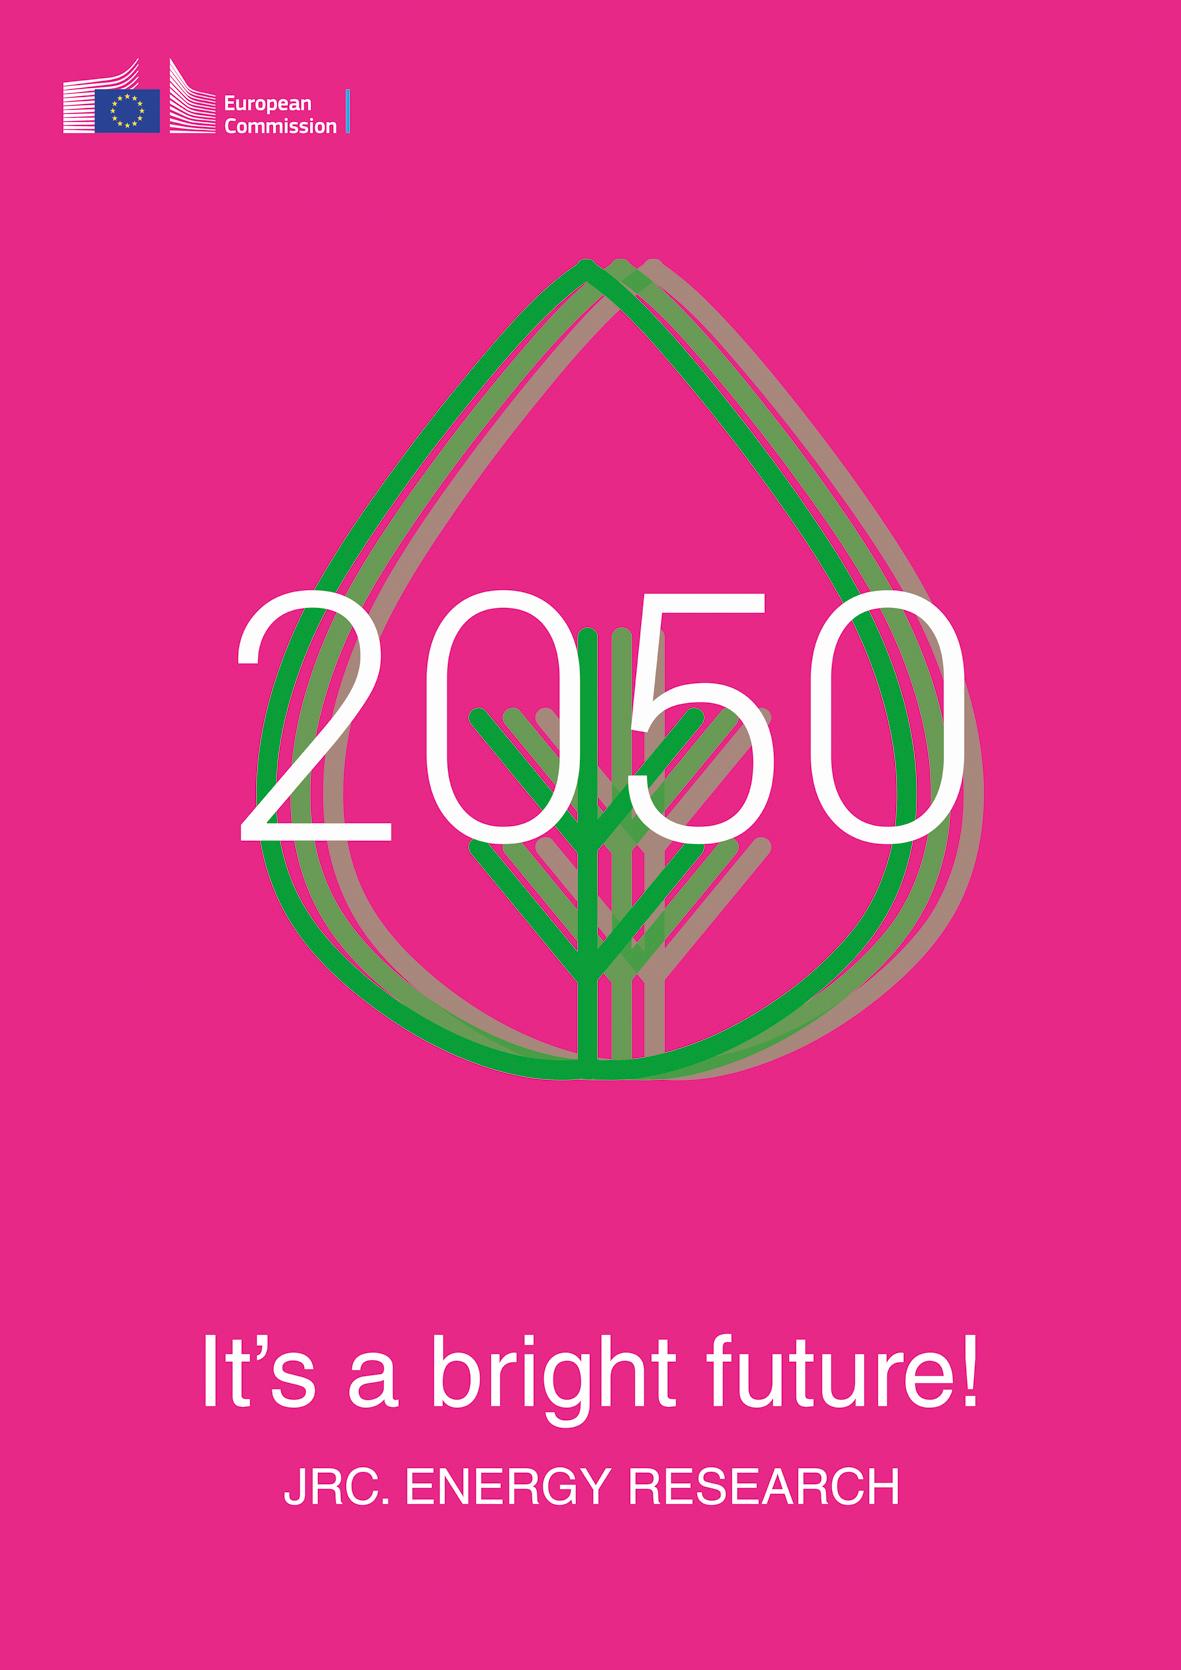 Nadira Klanco, Jenny Fiegler – Future Energy Campaign Poster Biomass